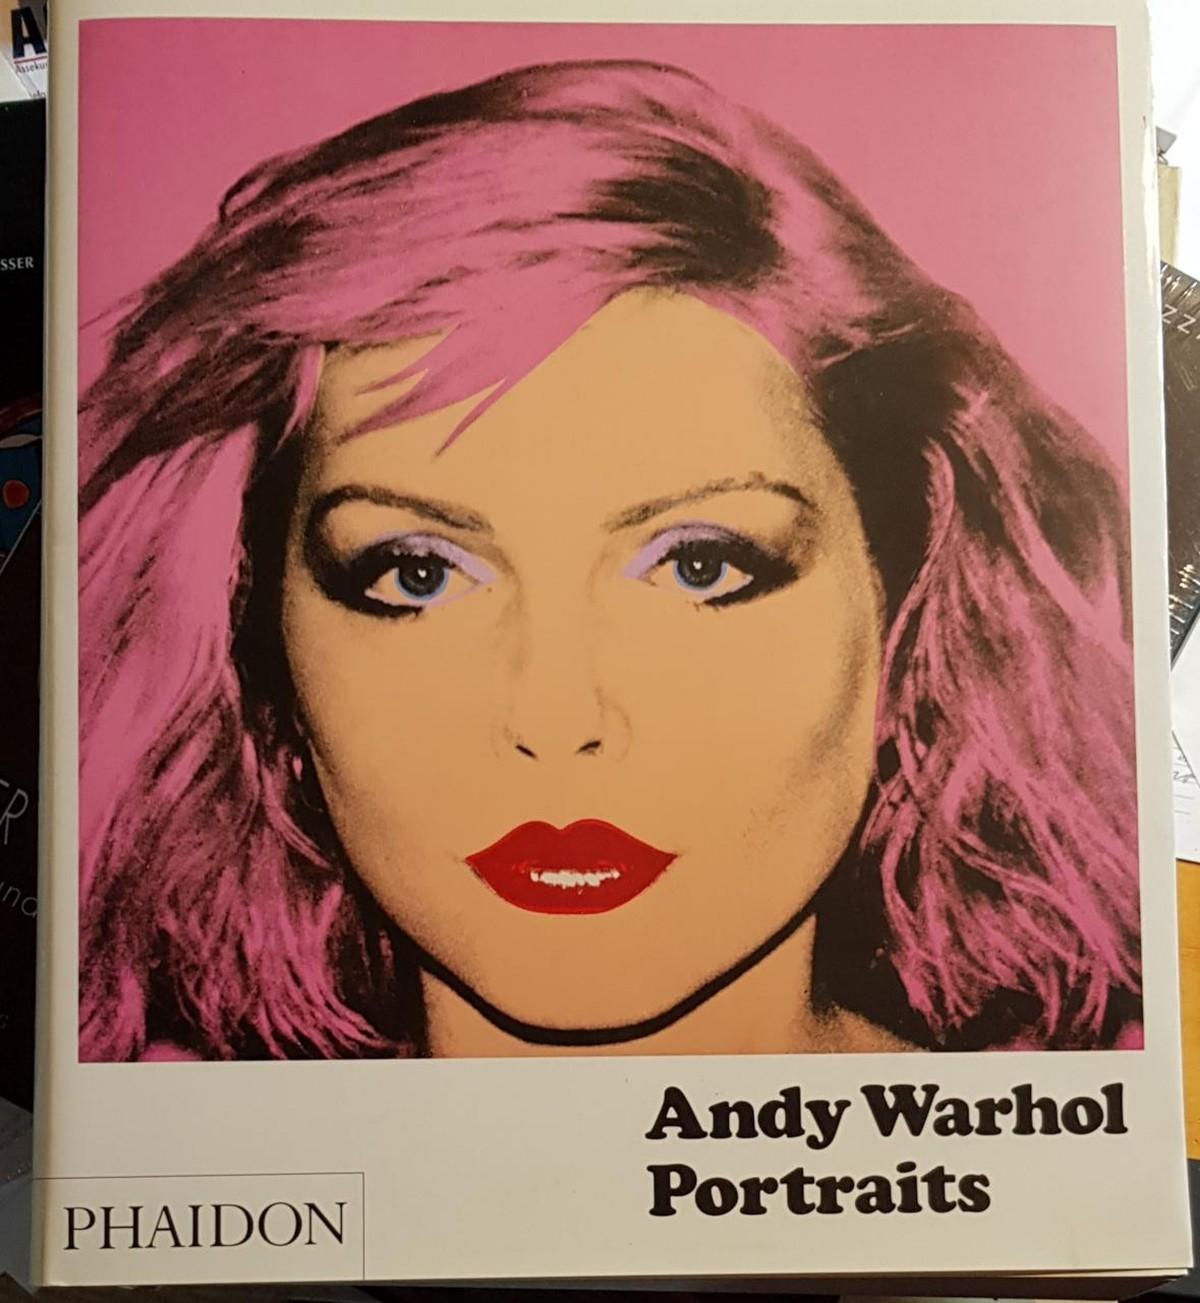 Andy Warhol - Andy Warhol: Portraits 2009 kopen? Bied vanaf 40!